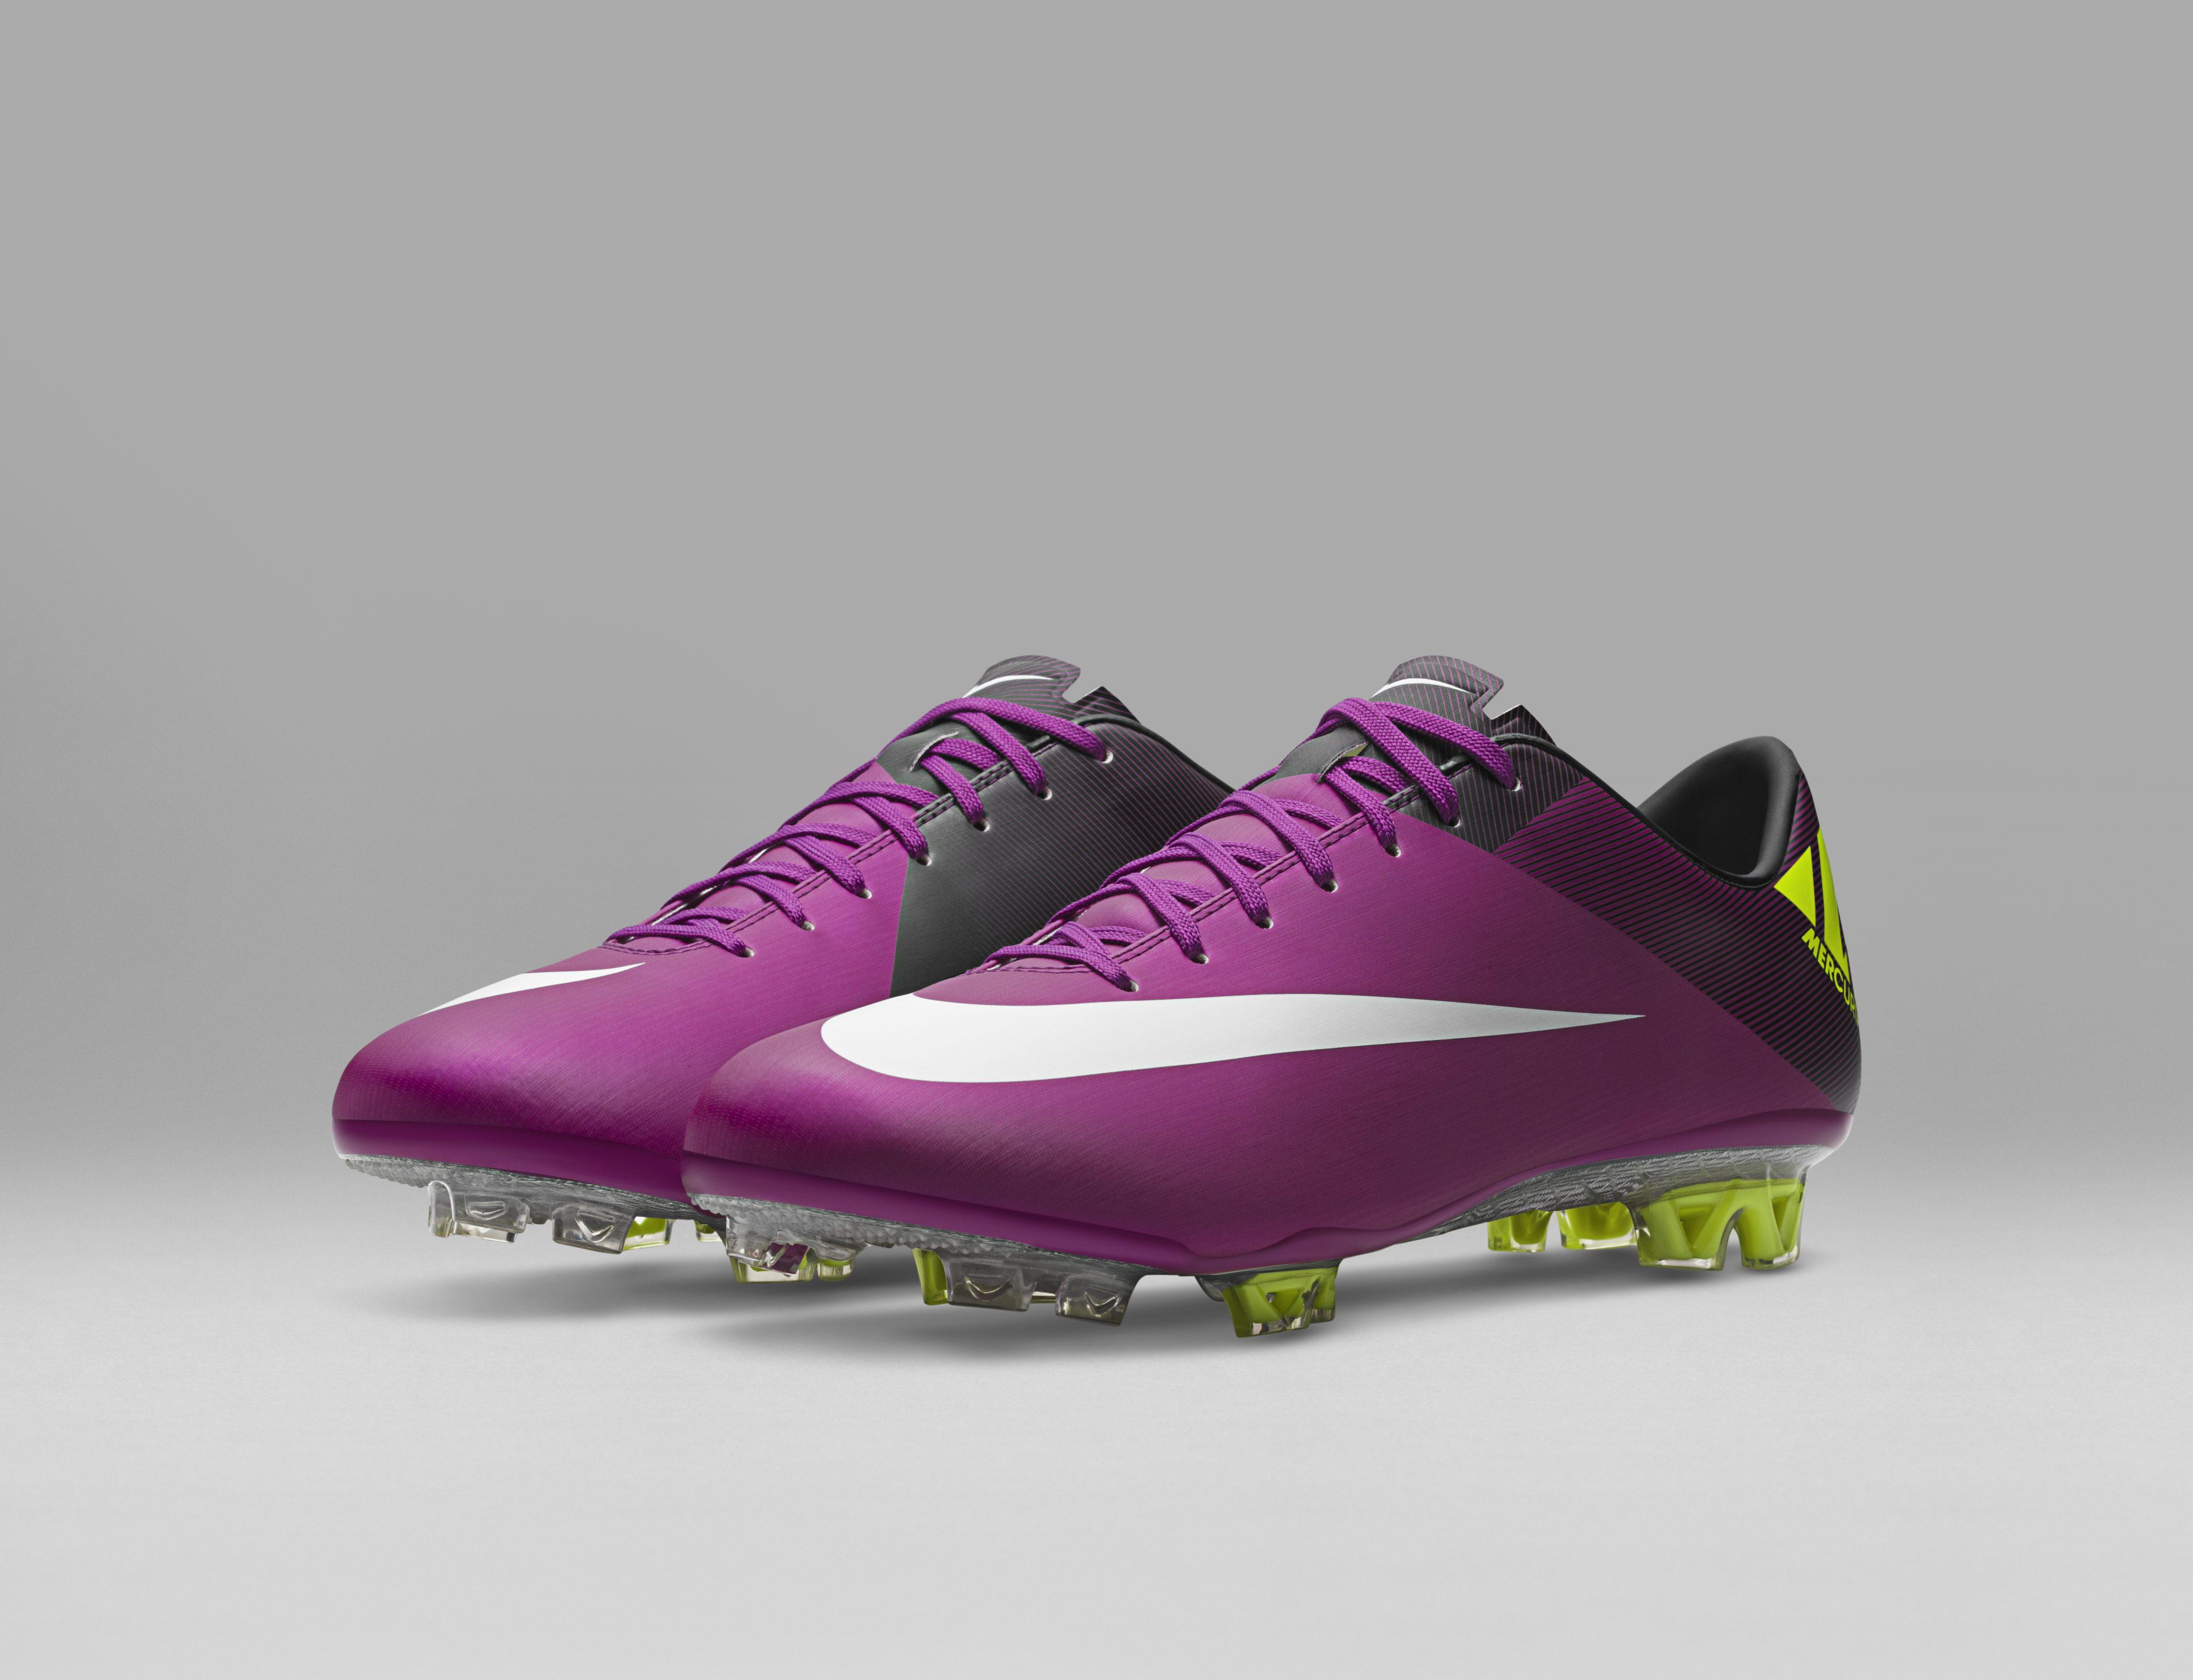 2011_Nike_Superfly_III__55734.jpg